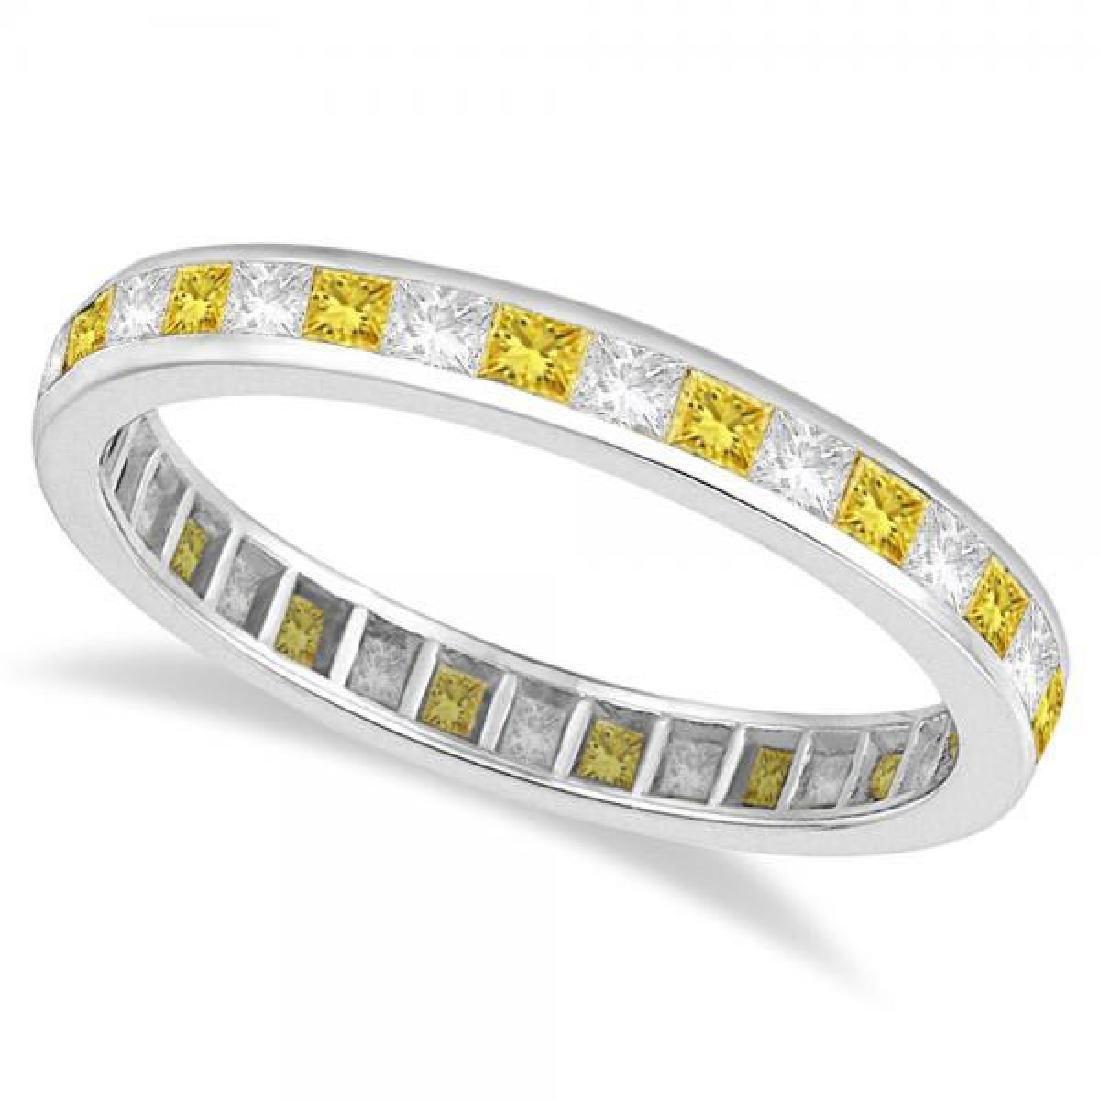 Princess-Cut Yellow and White Diamond Eternity Ring 14k